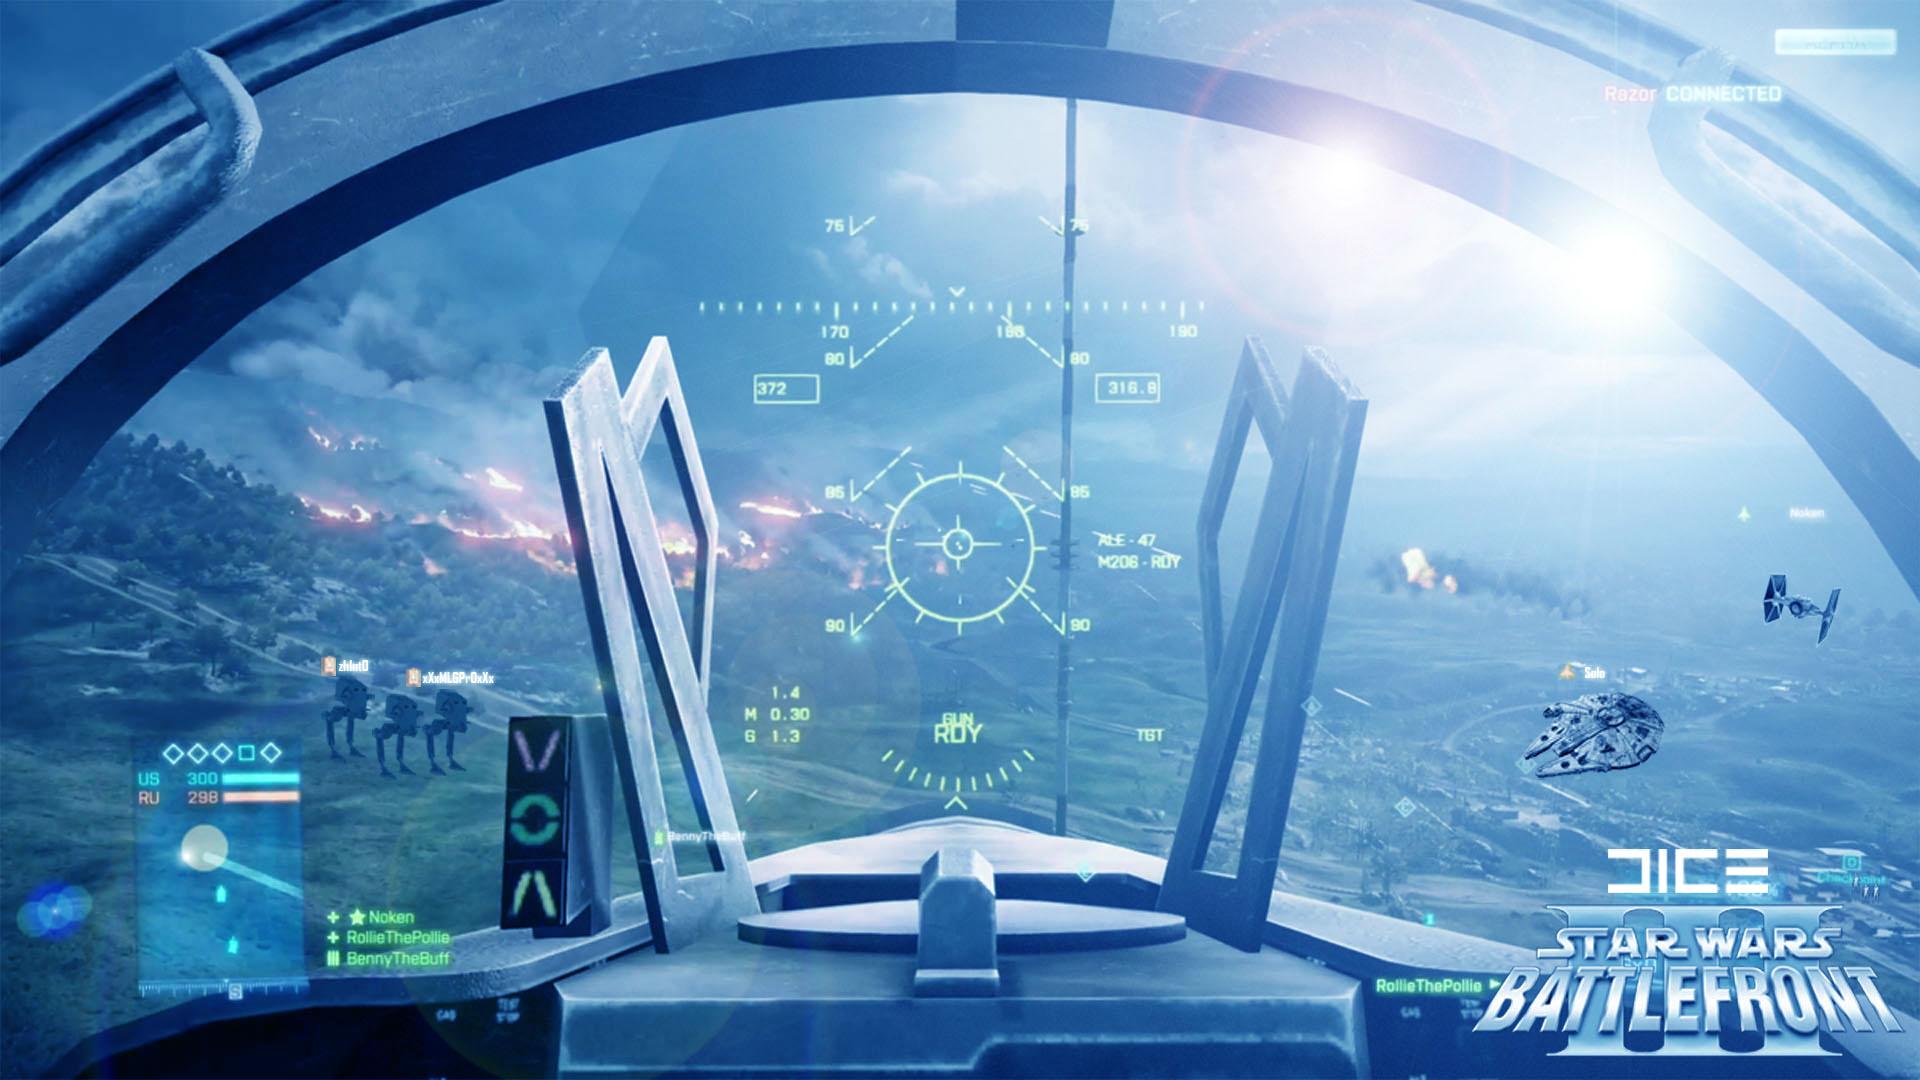 STAR WARS BATTLEFRONT sci fi spaceship i wallpaper 1920x1080 1920x1080